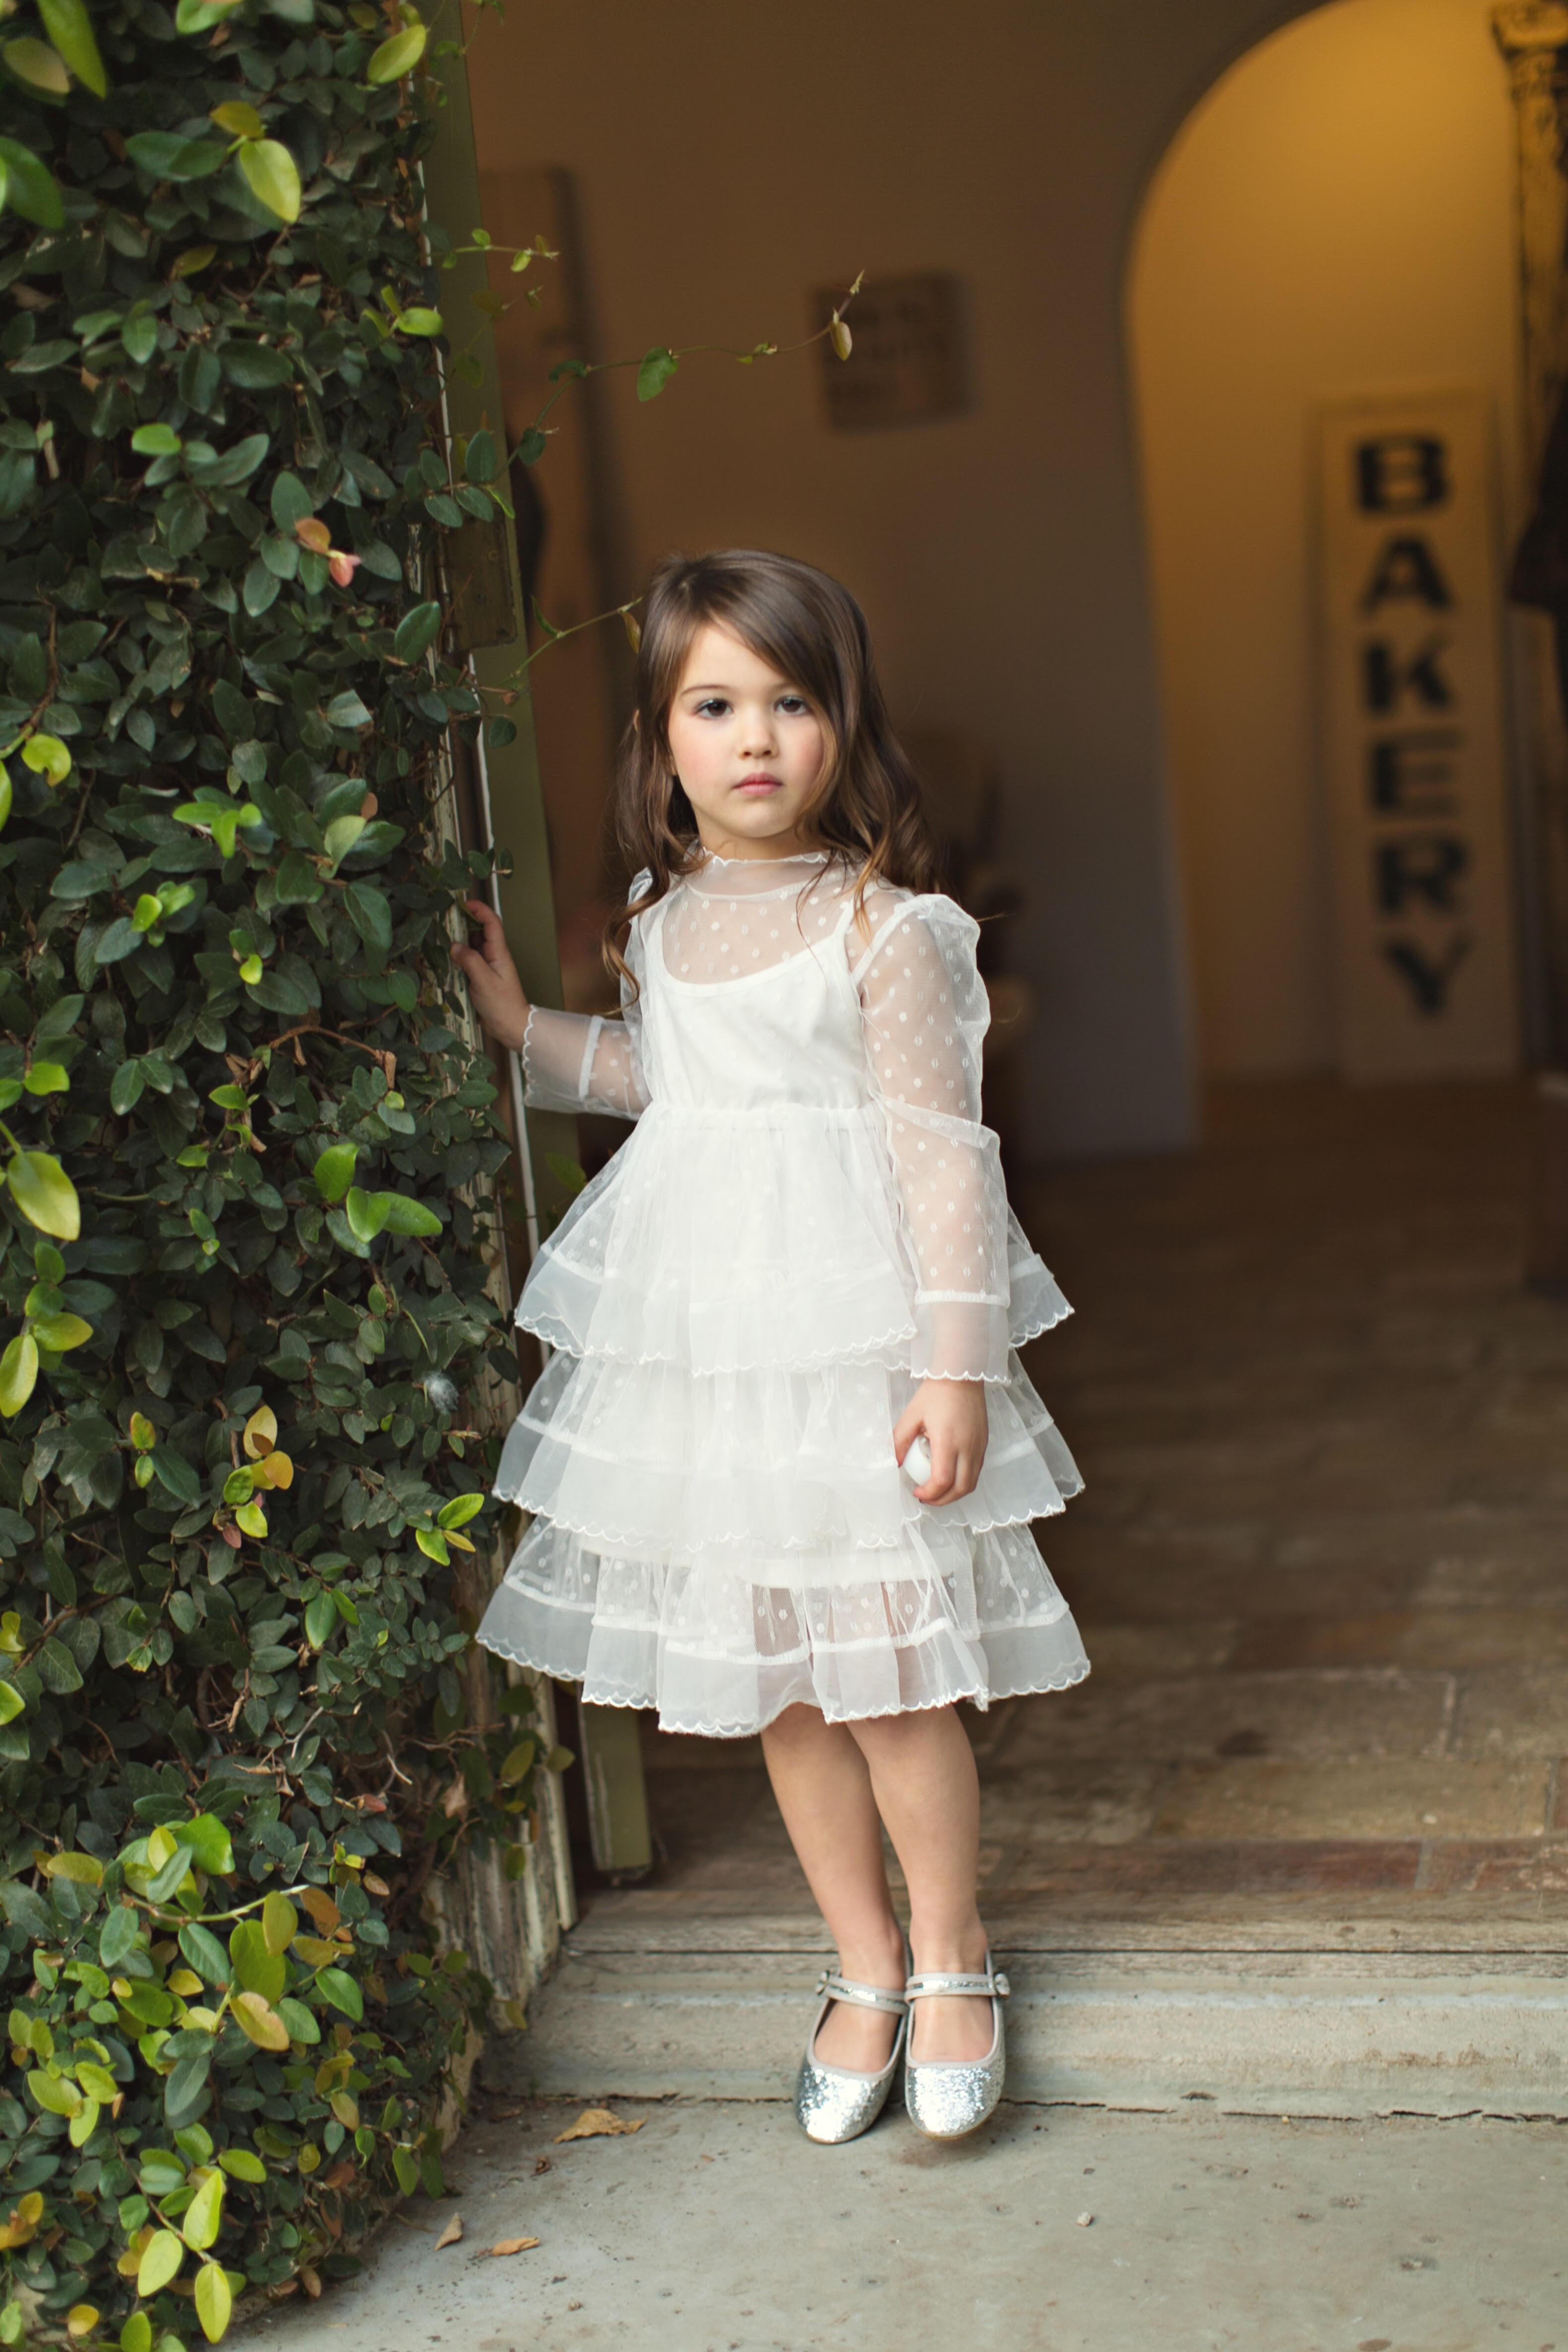 0e0b908a2 Wedding Ideas: Shop These Cute Flower Girl Dresses - Inside Weddings